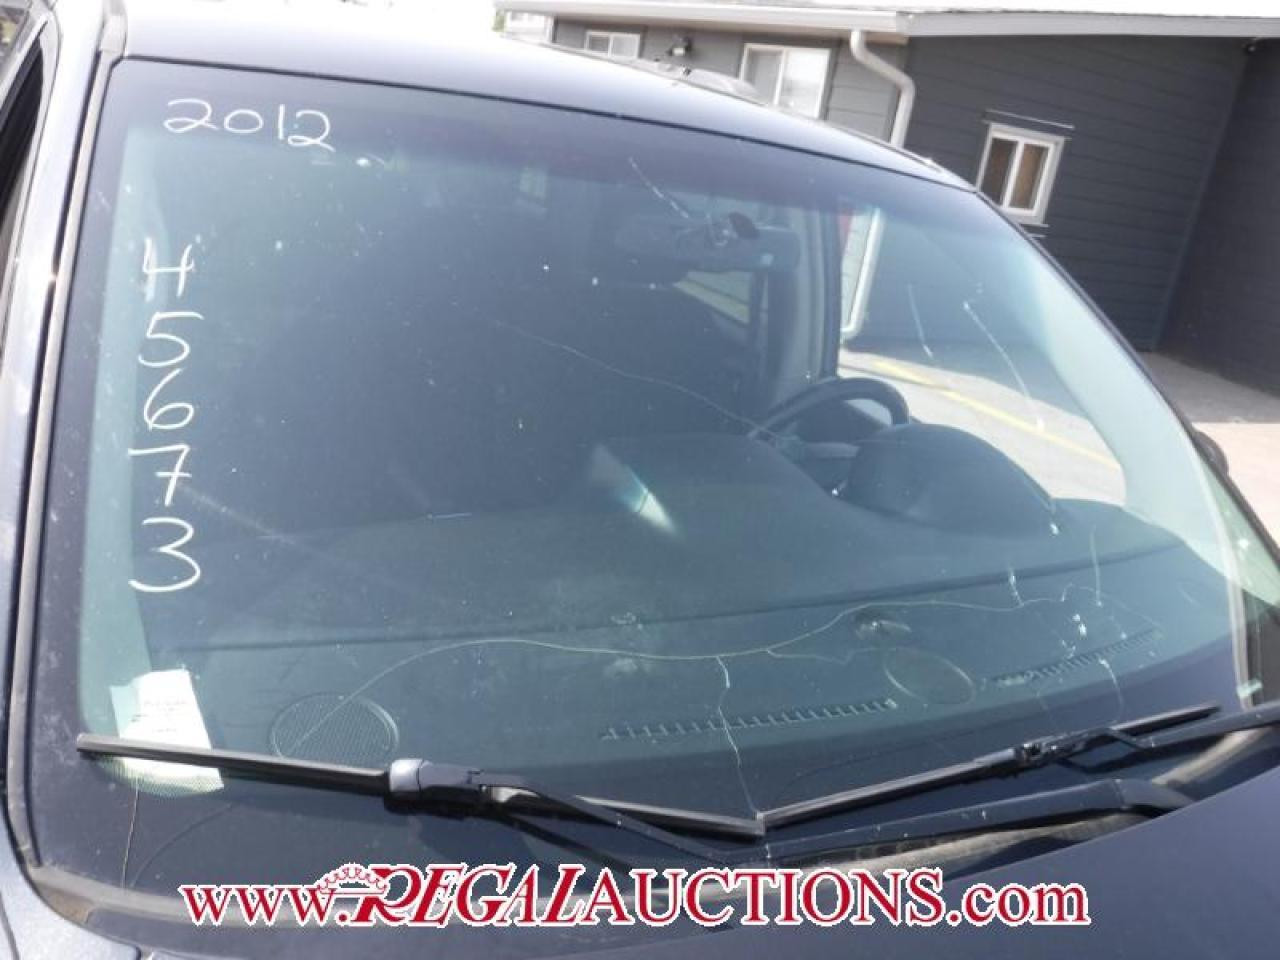 2012 Chrysler Town & Country SXT 4D Wagon